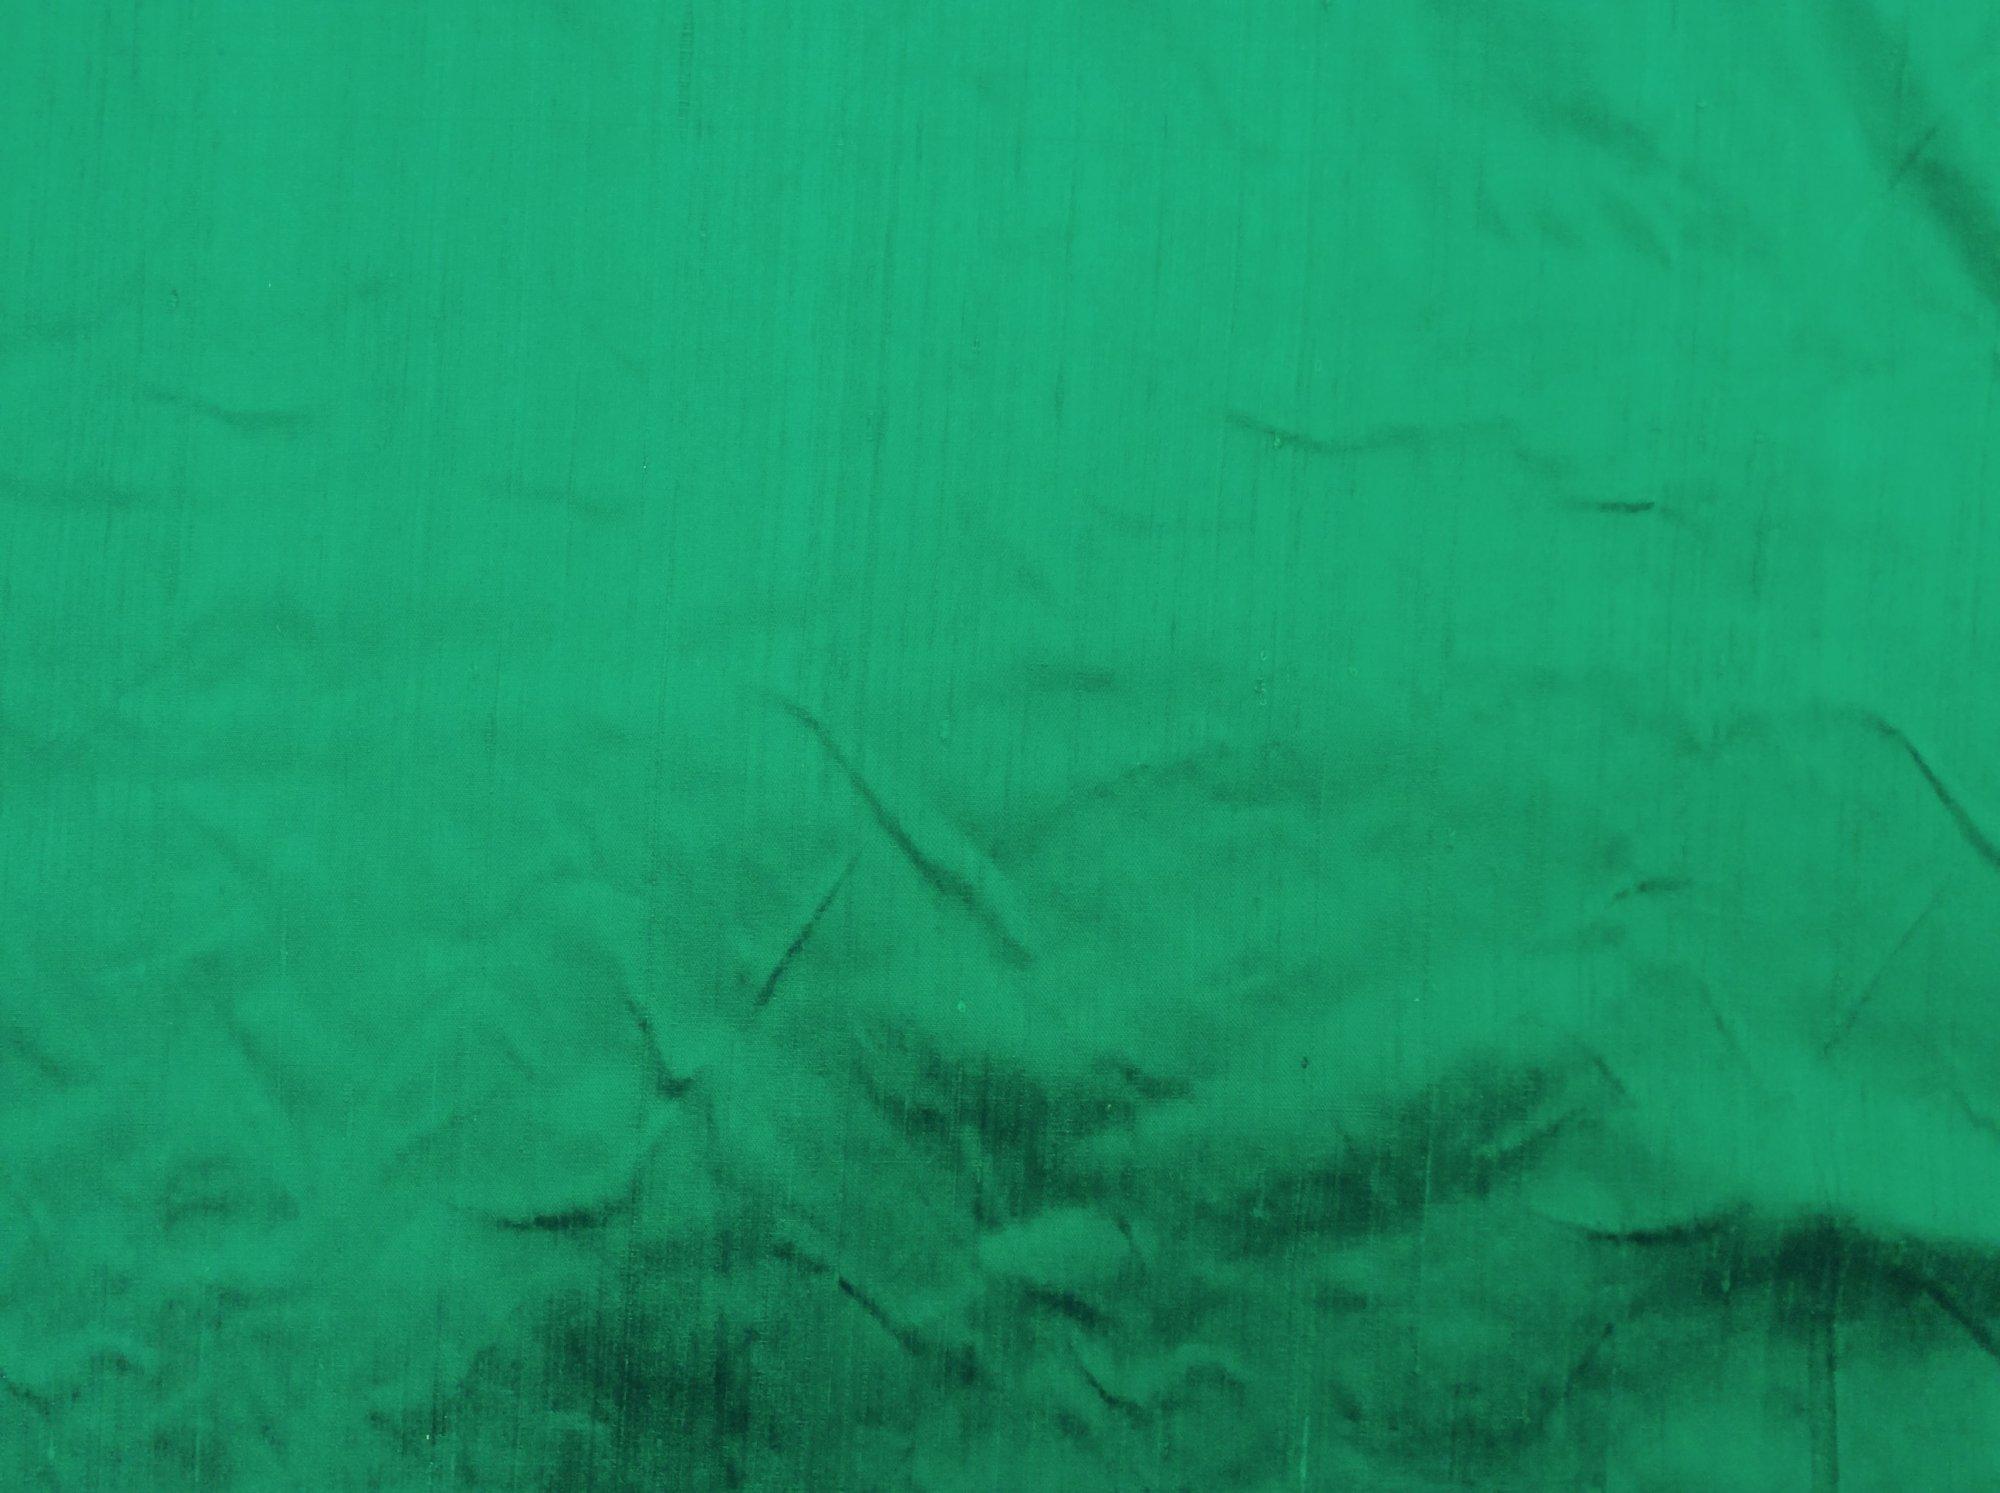 100% Dupioni Silk Emerald Green Color Drapery Silk Costume Apparel Hand Woven Sewing Fabric SHW03